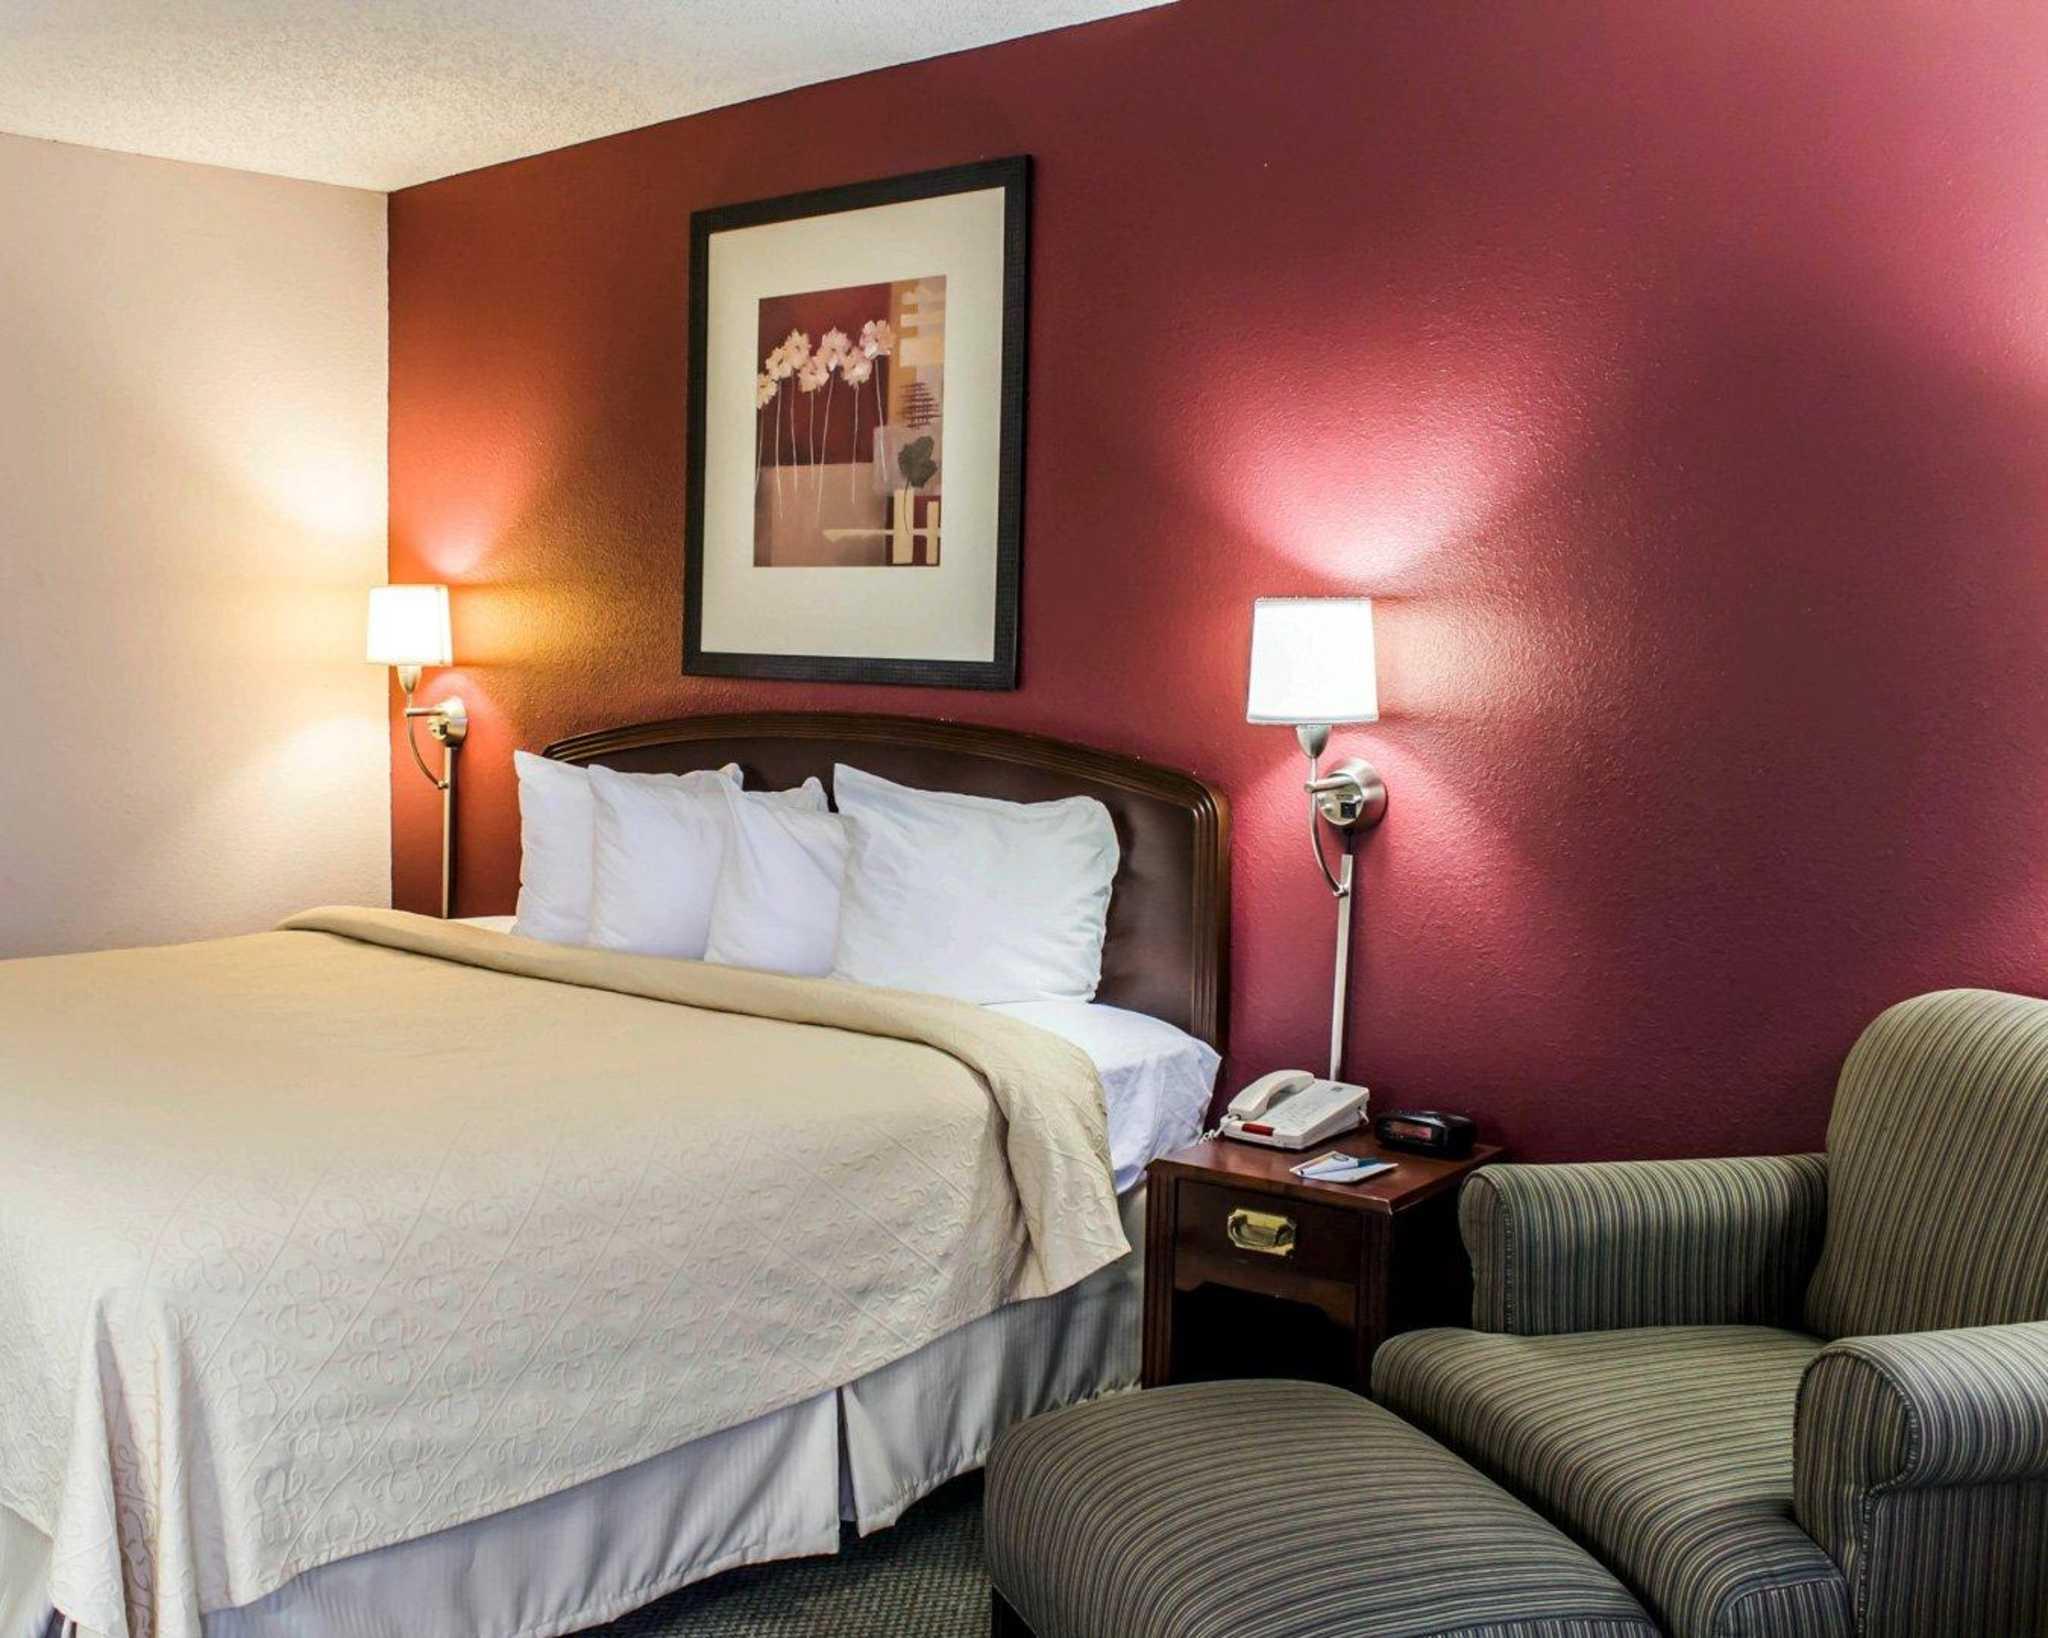 Quality Inn Roanoke near Lake Gaston image 8